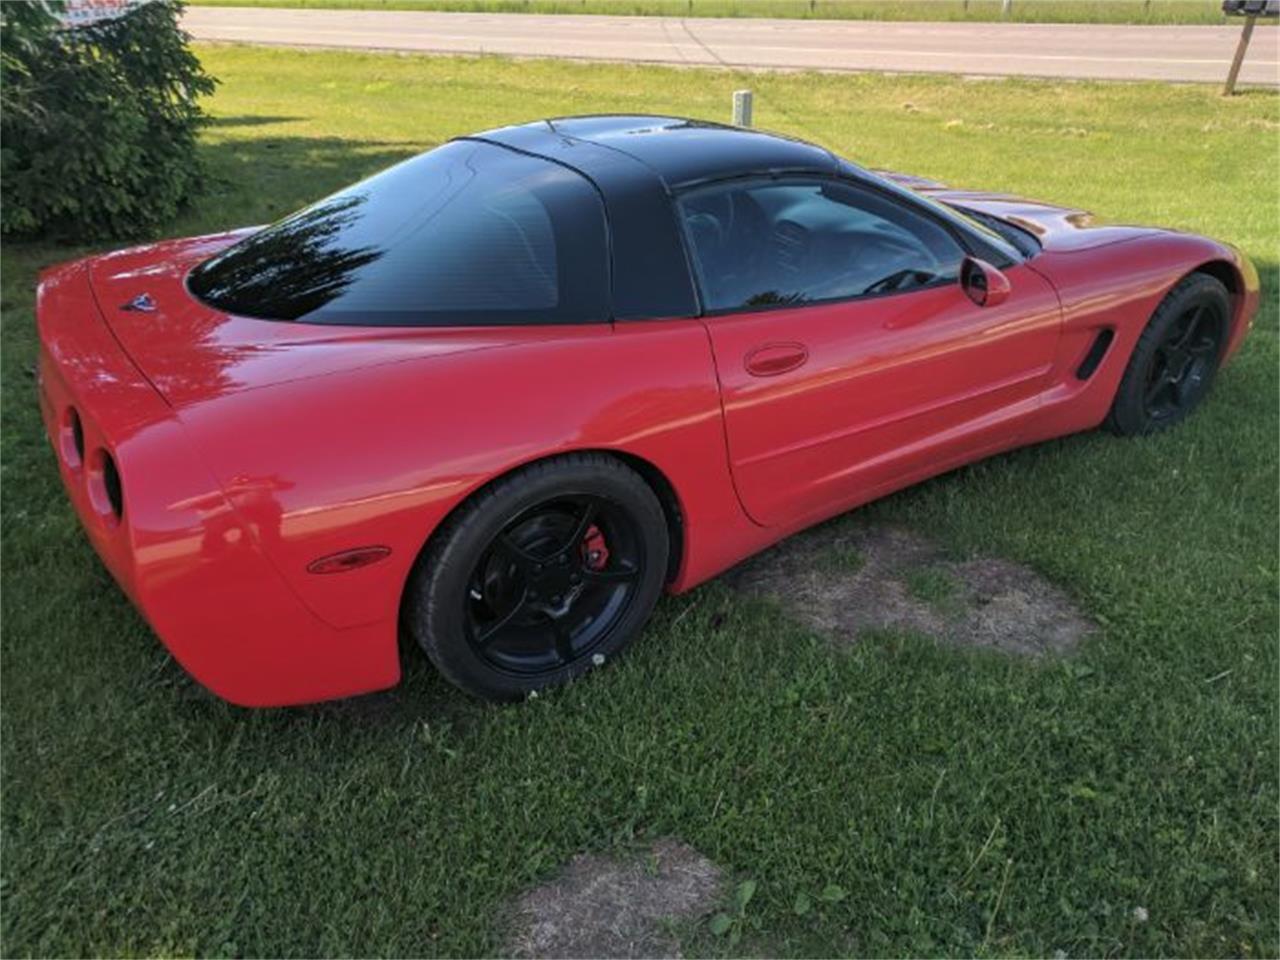 Large Picture of 2000 Corvette located in Cadillac Michigan - $13,900.00 - L7I1